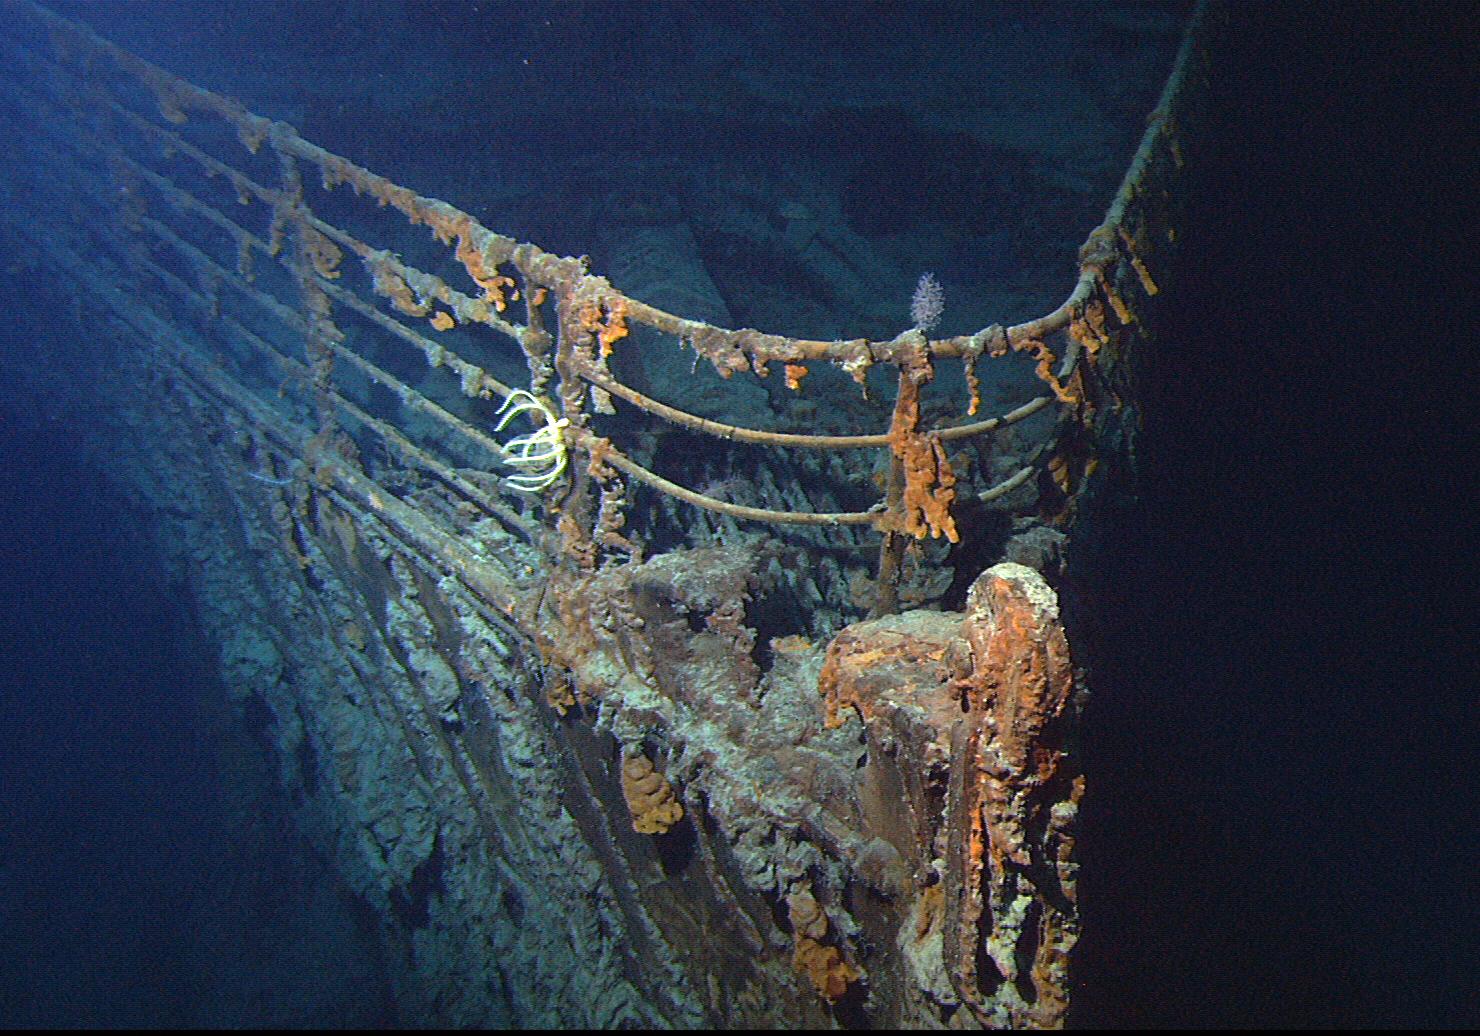 Damaged ships and shipwrecks: RMS Titanic under sea